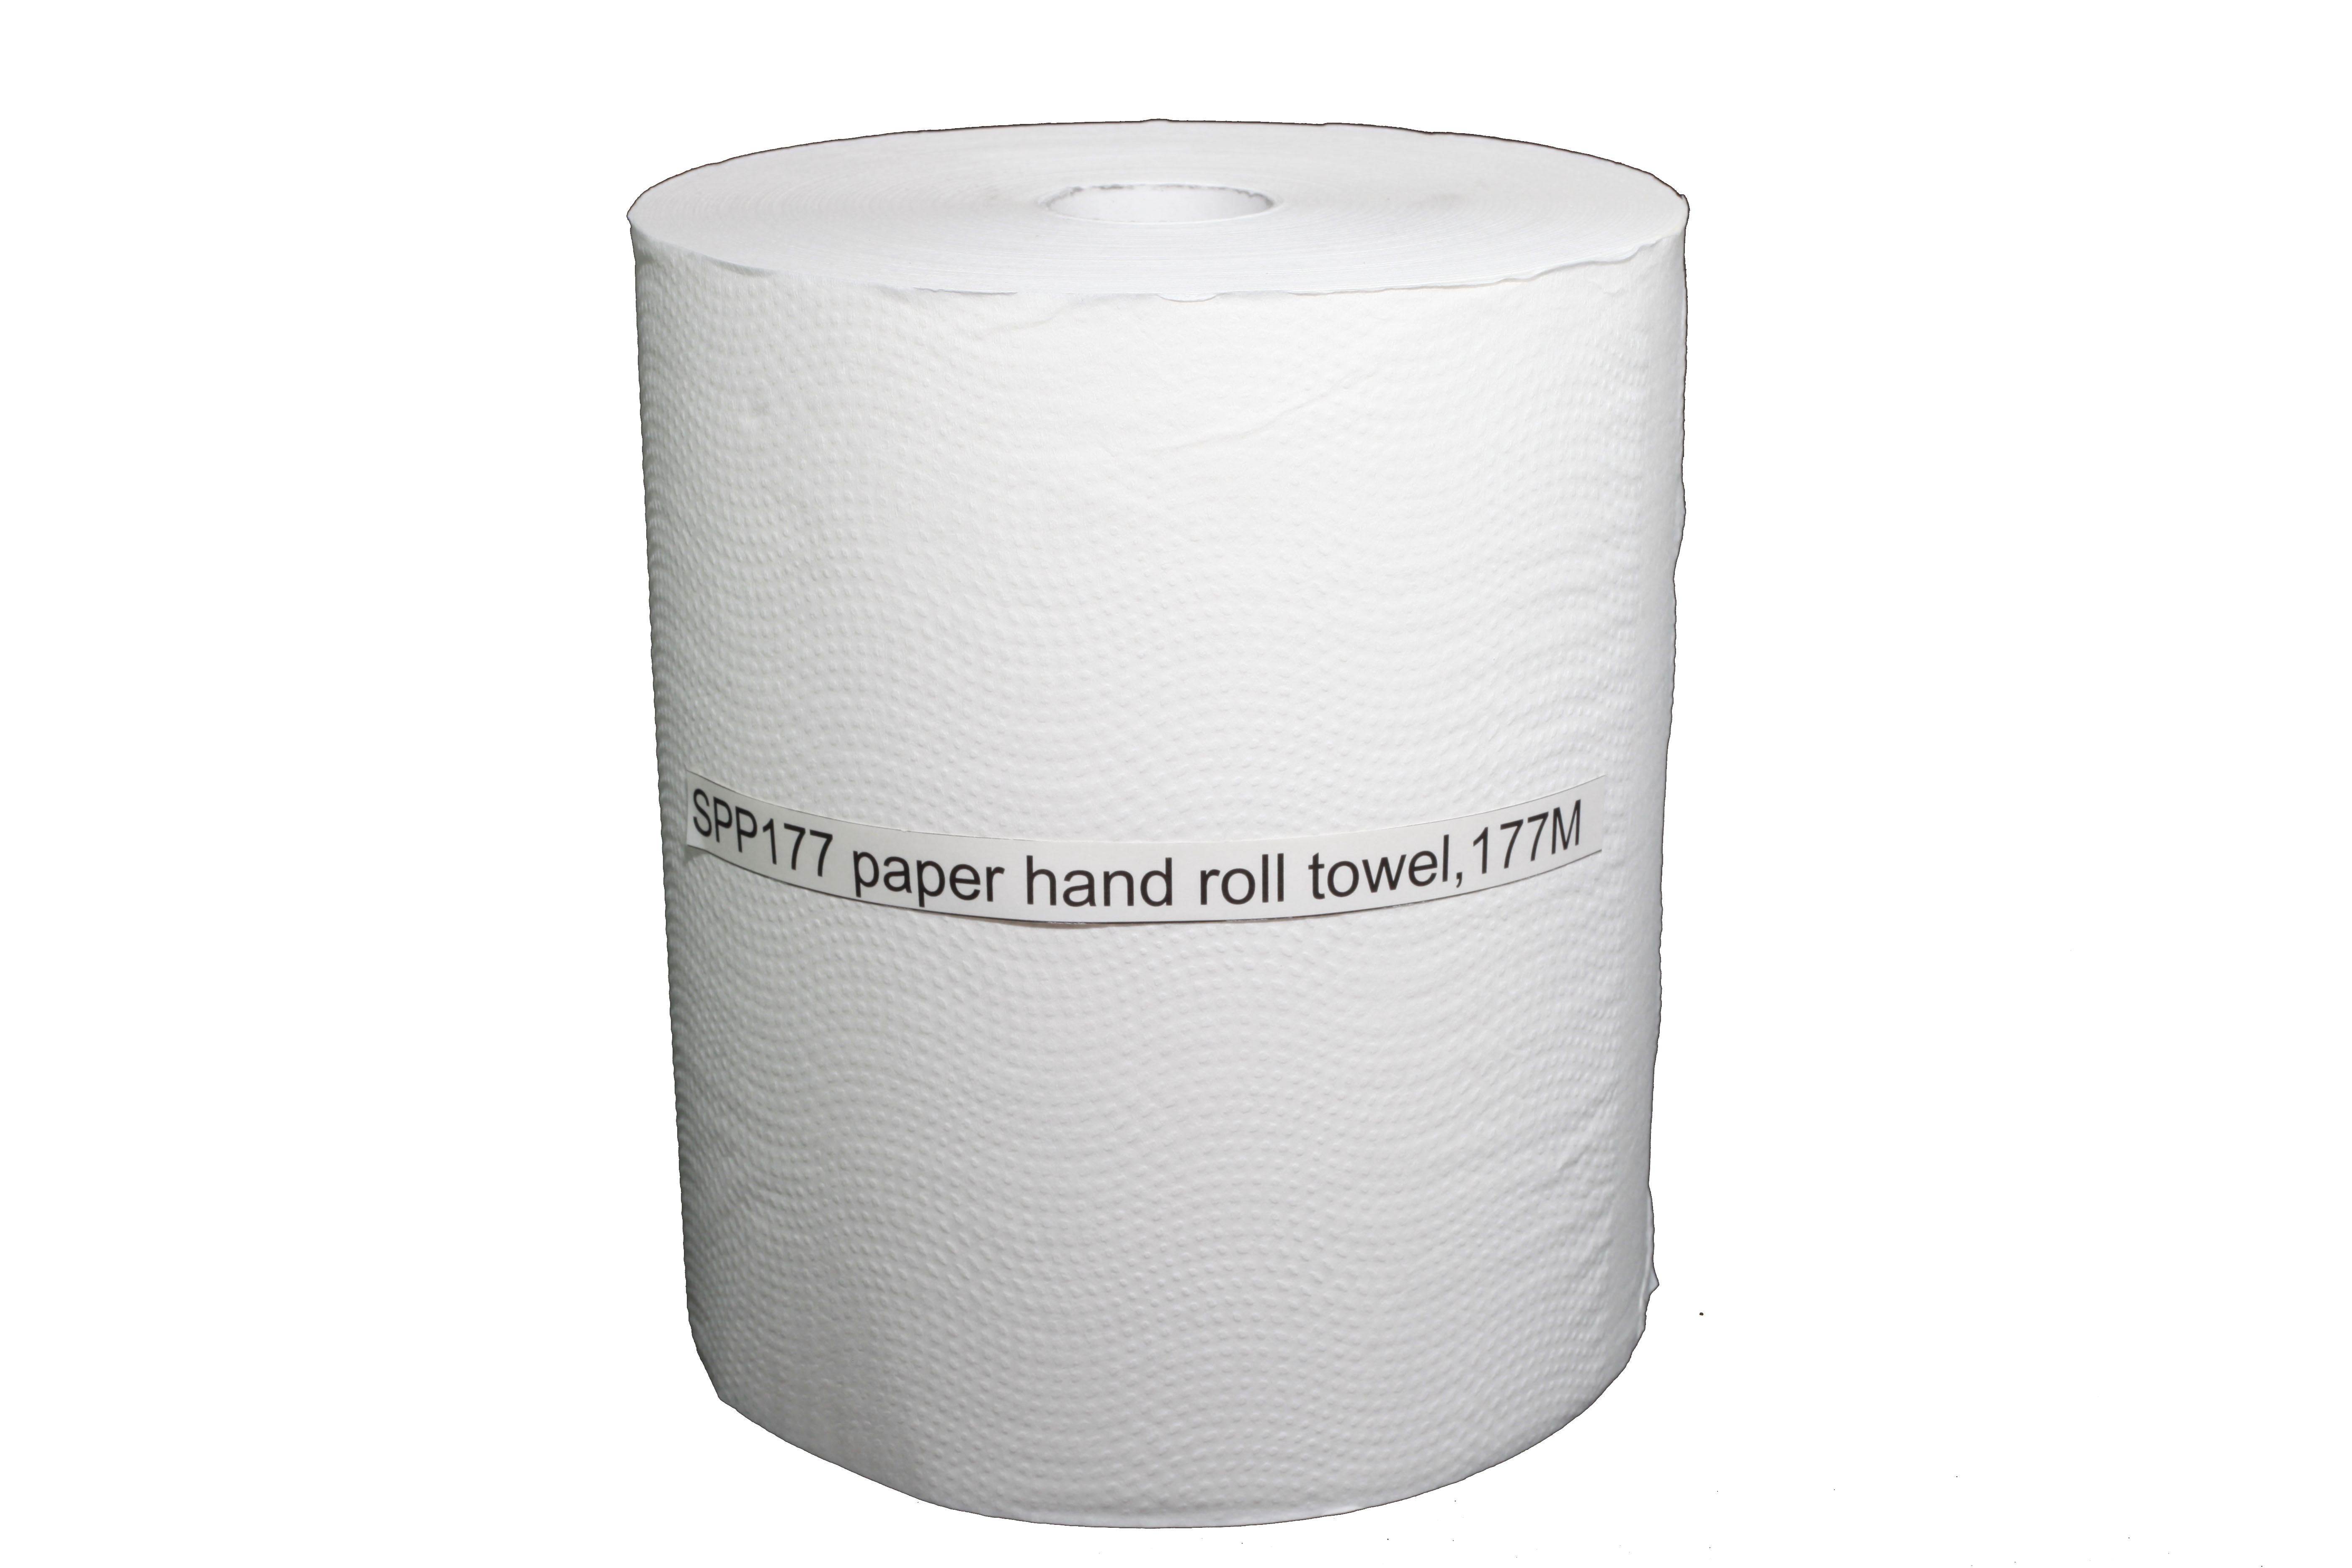 SP 177 Hand Towel Roll